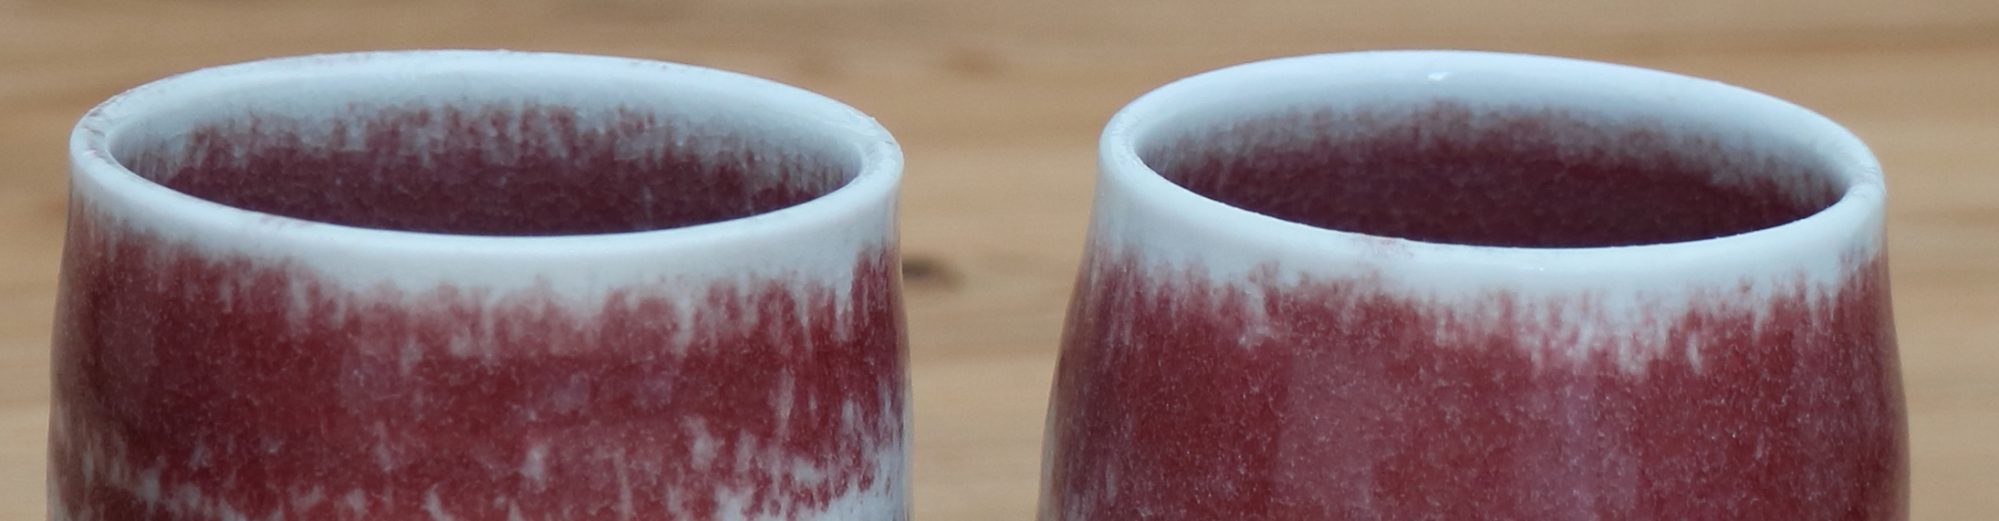 Thomas Bain Ceramics